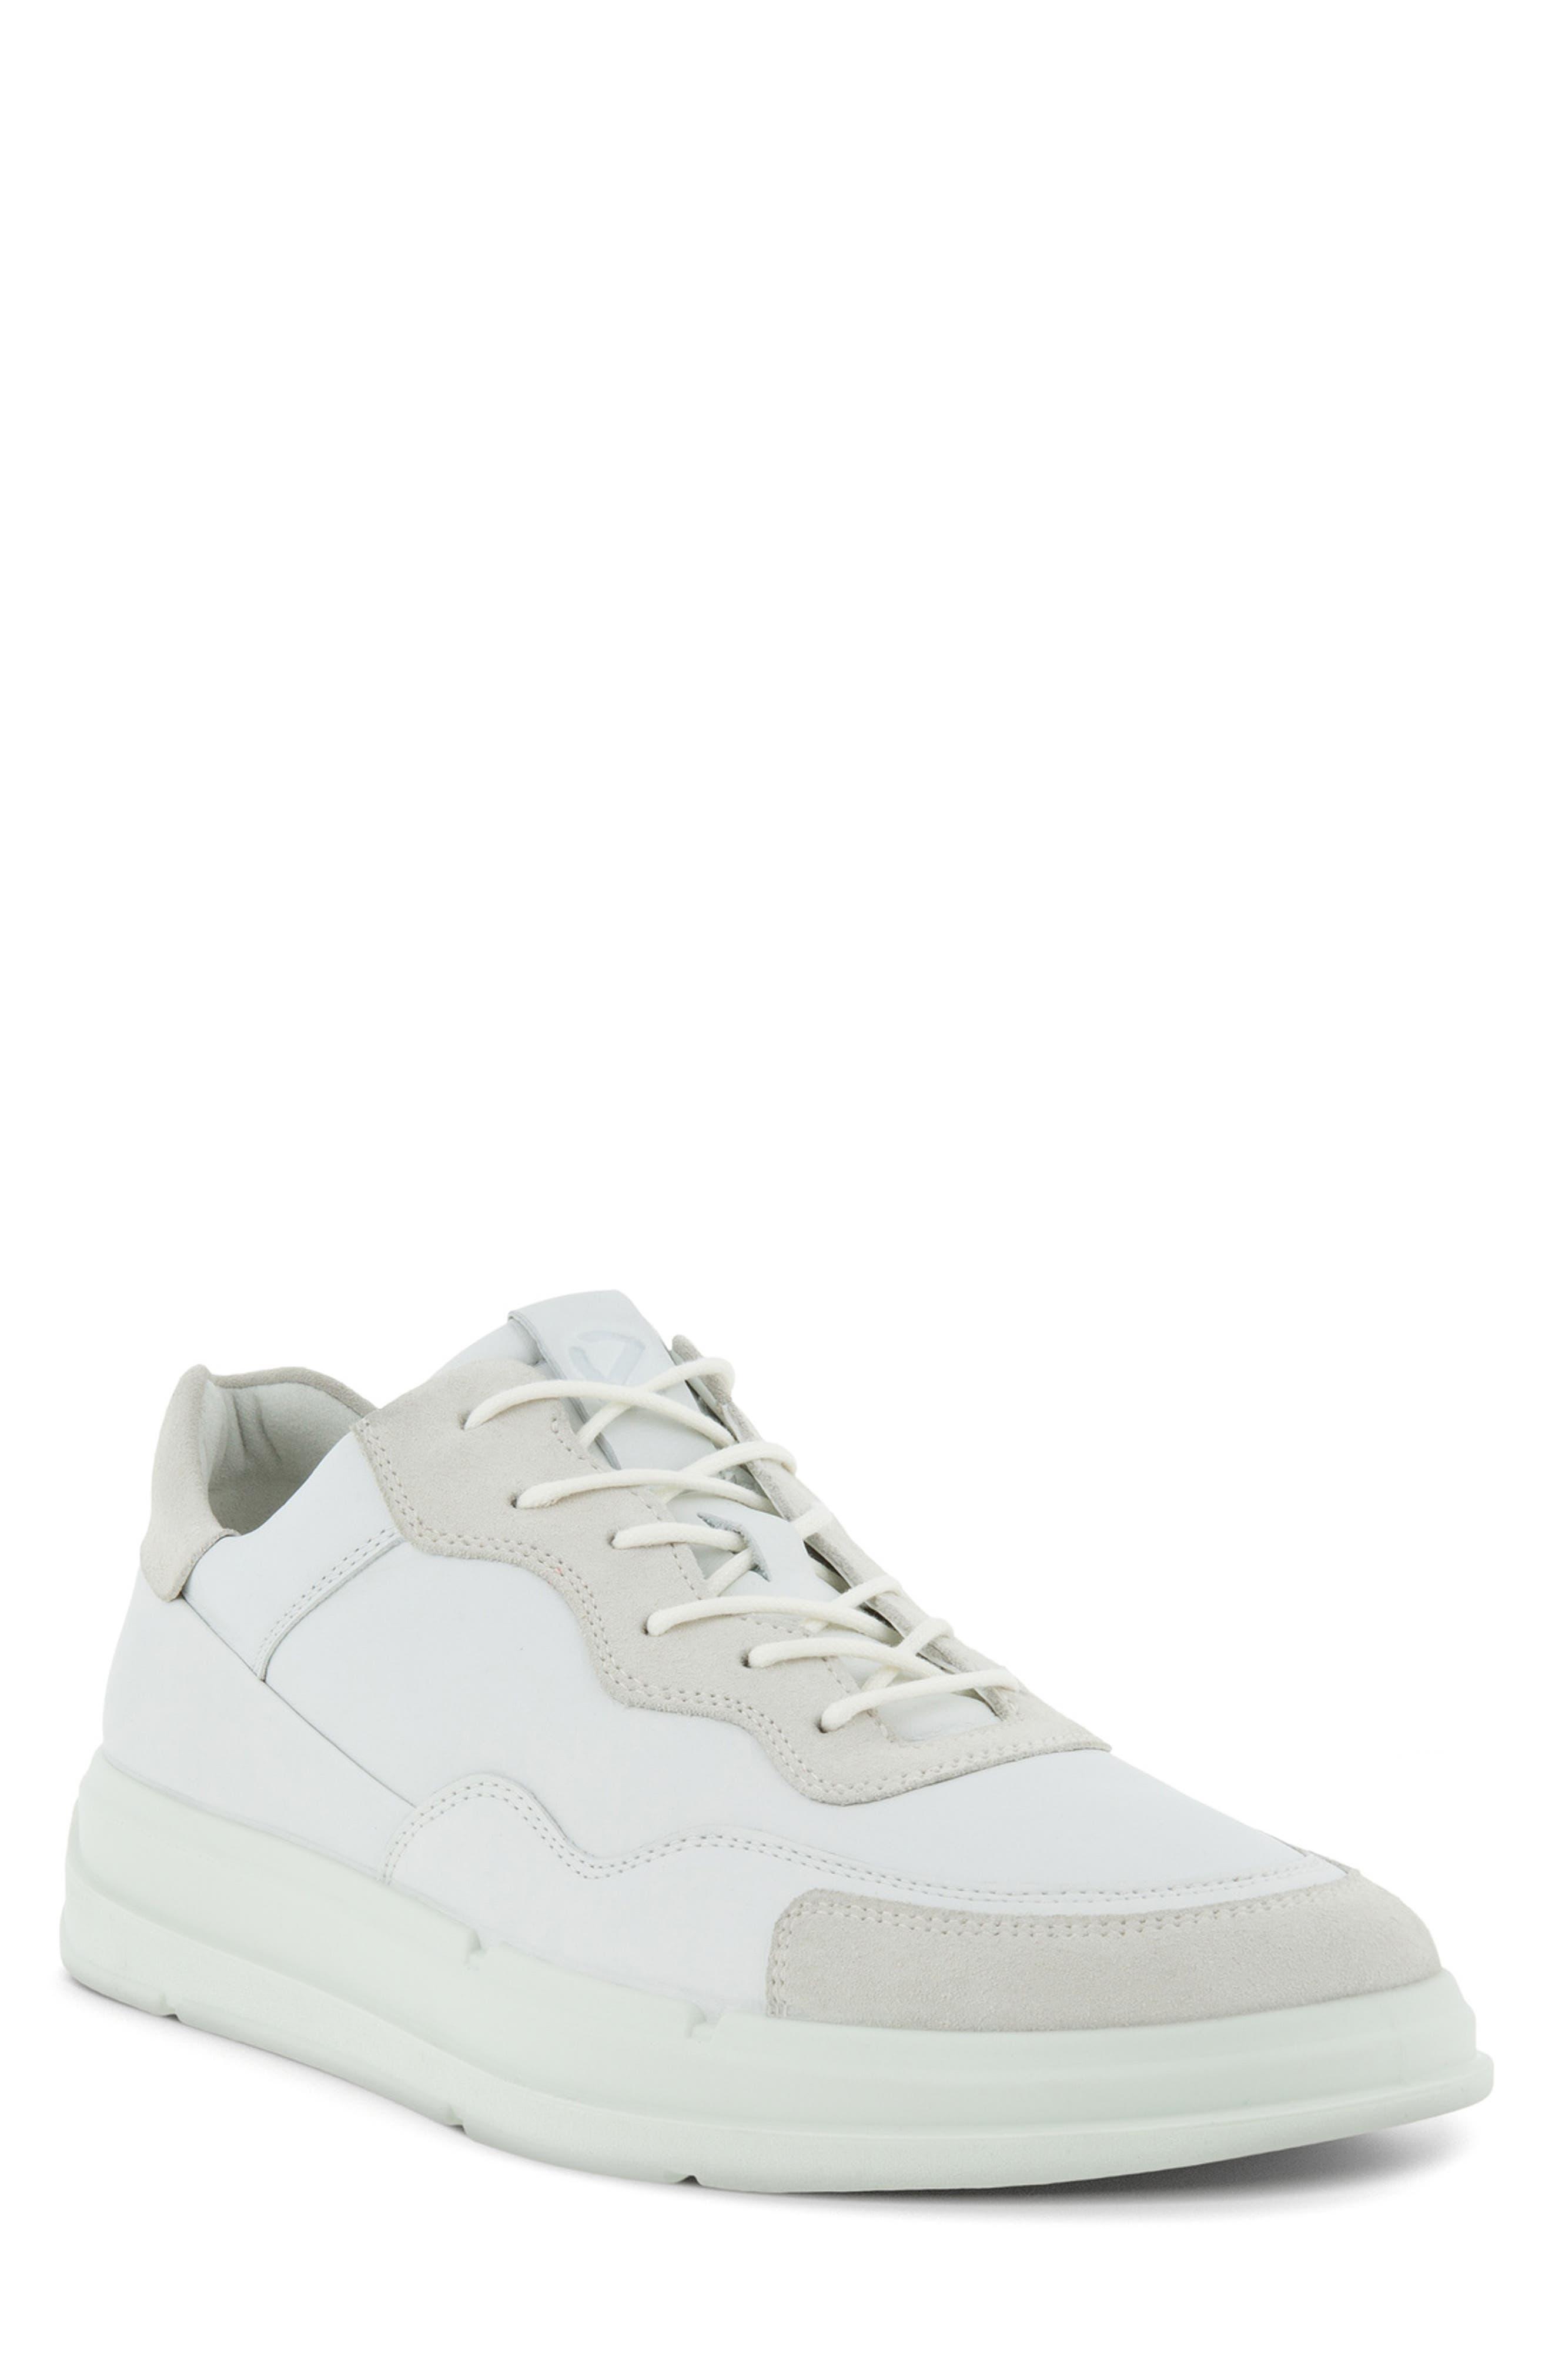 Men's Ecco Soft X Sneaker